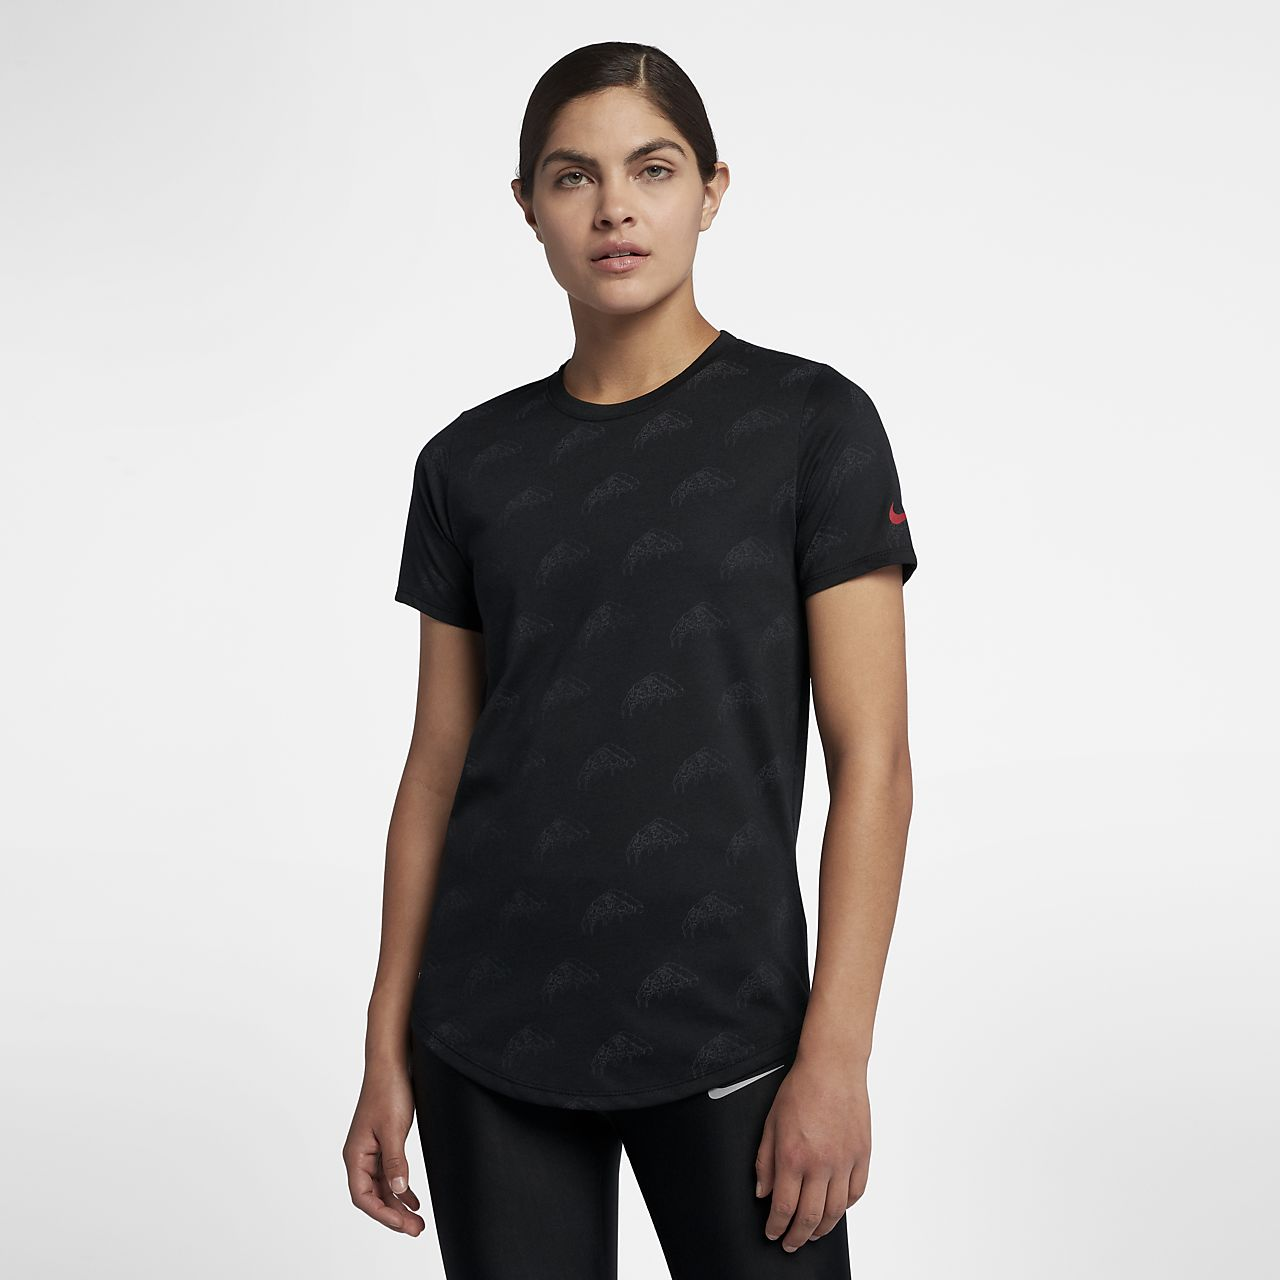 ... Nike Dri-FIT Women's Printed Running T-Shirt